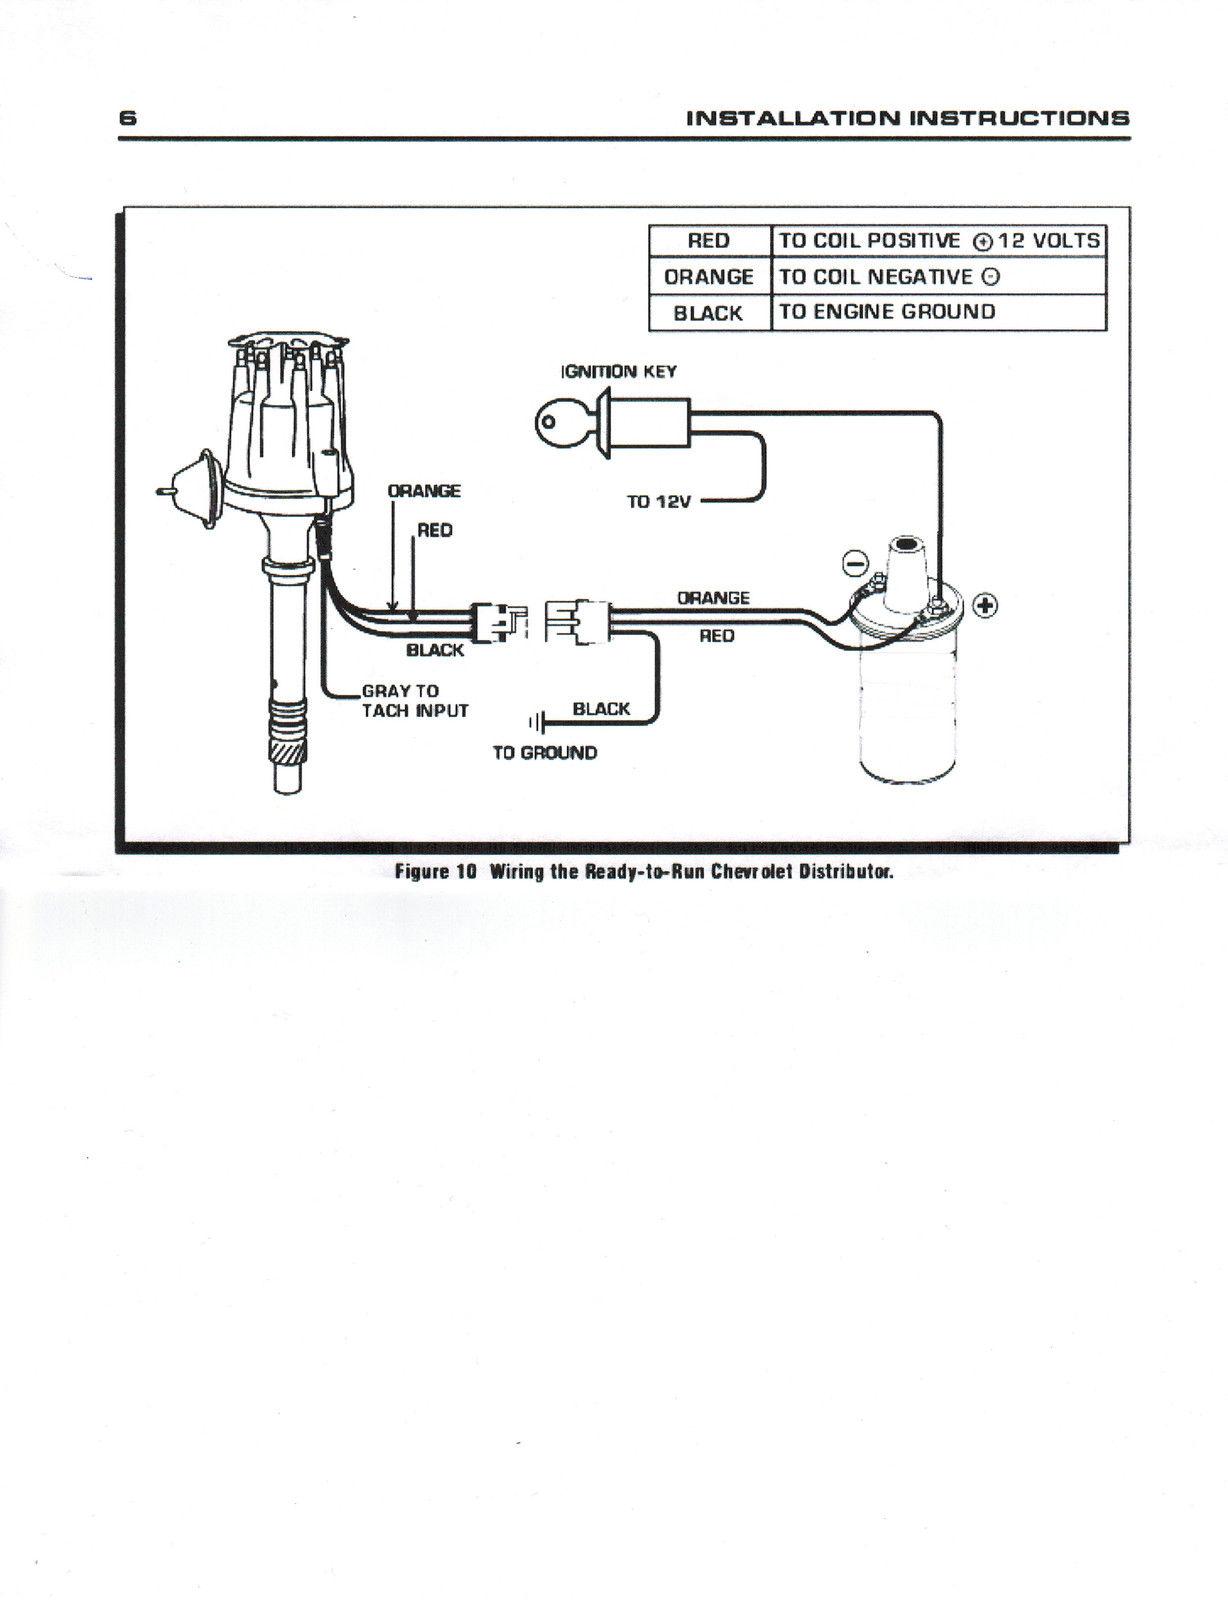 hei distributor spark plug wiring diagram